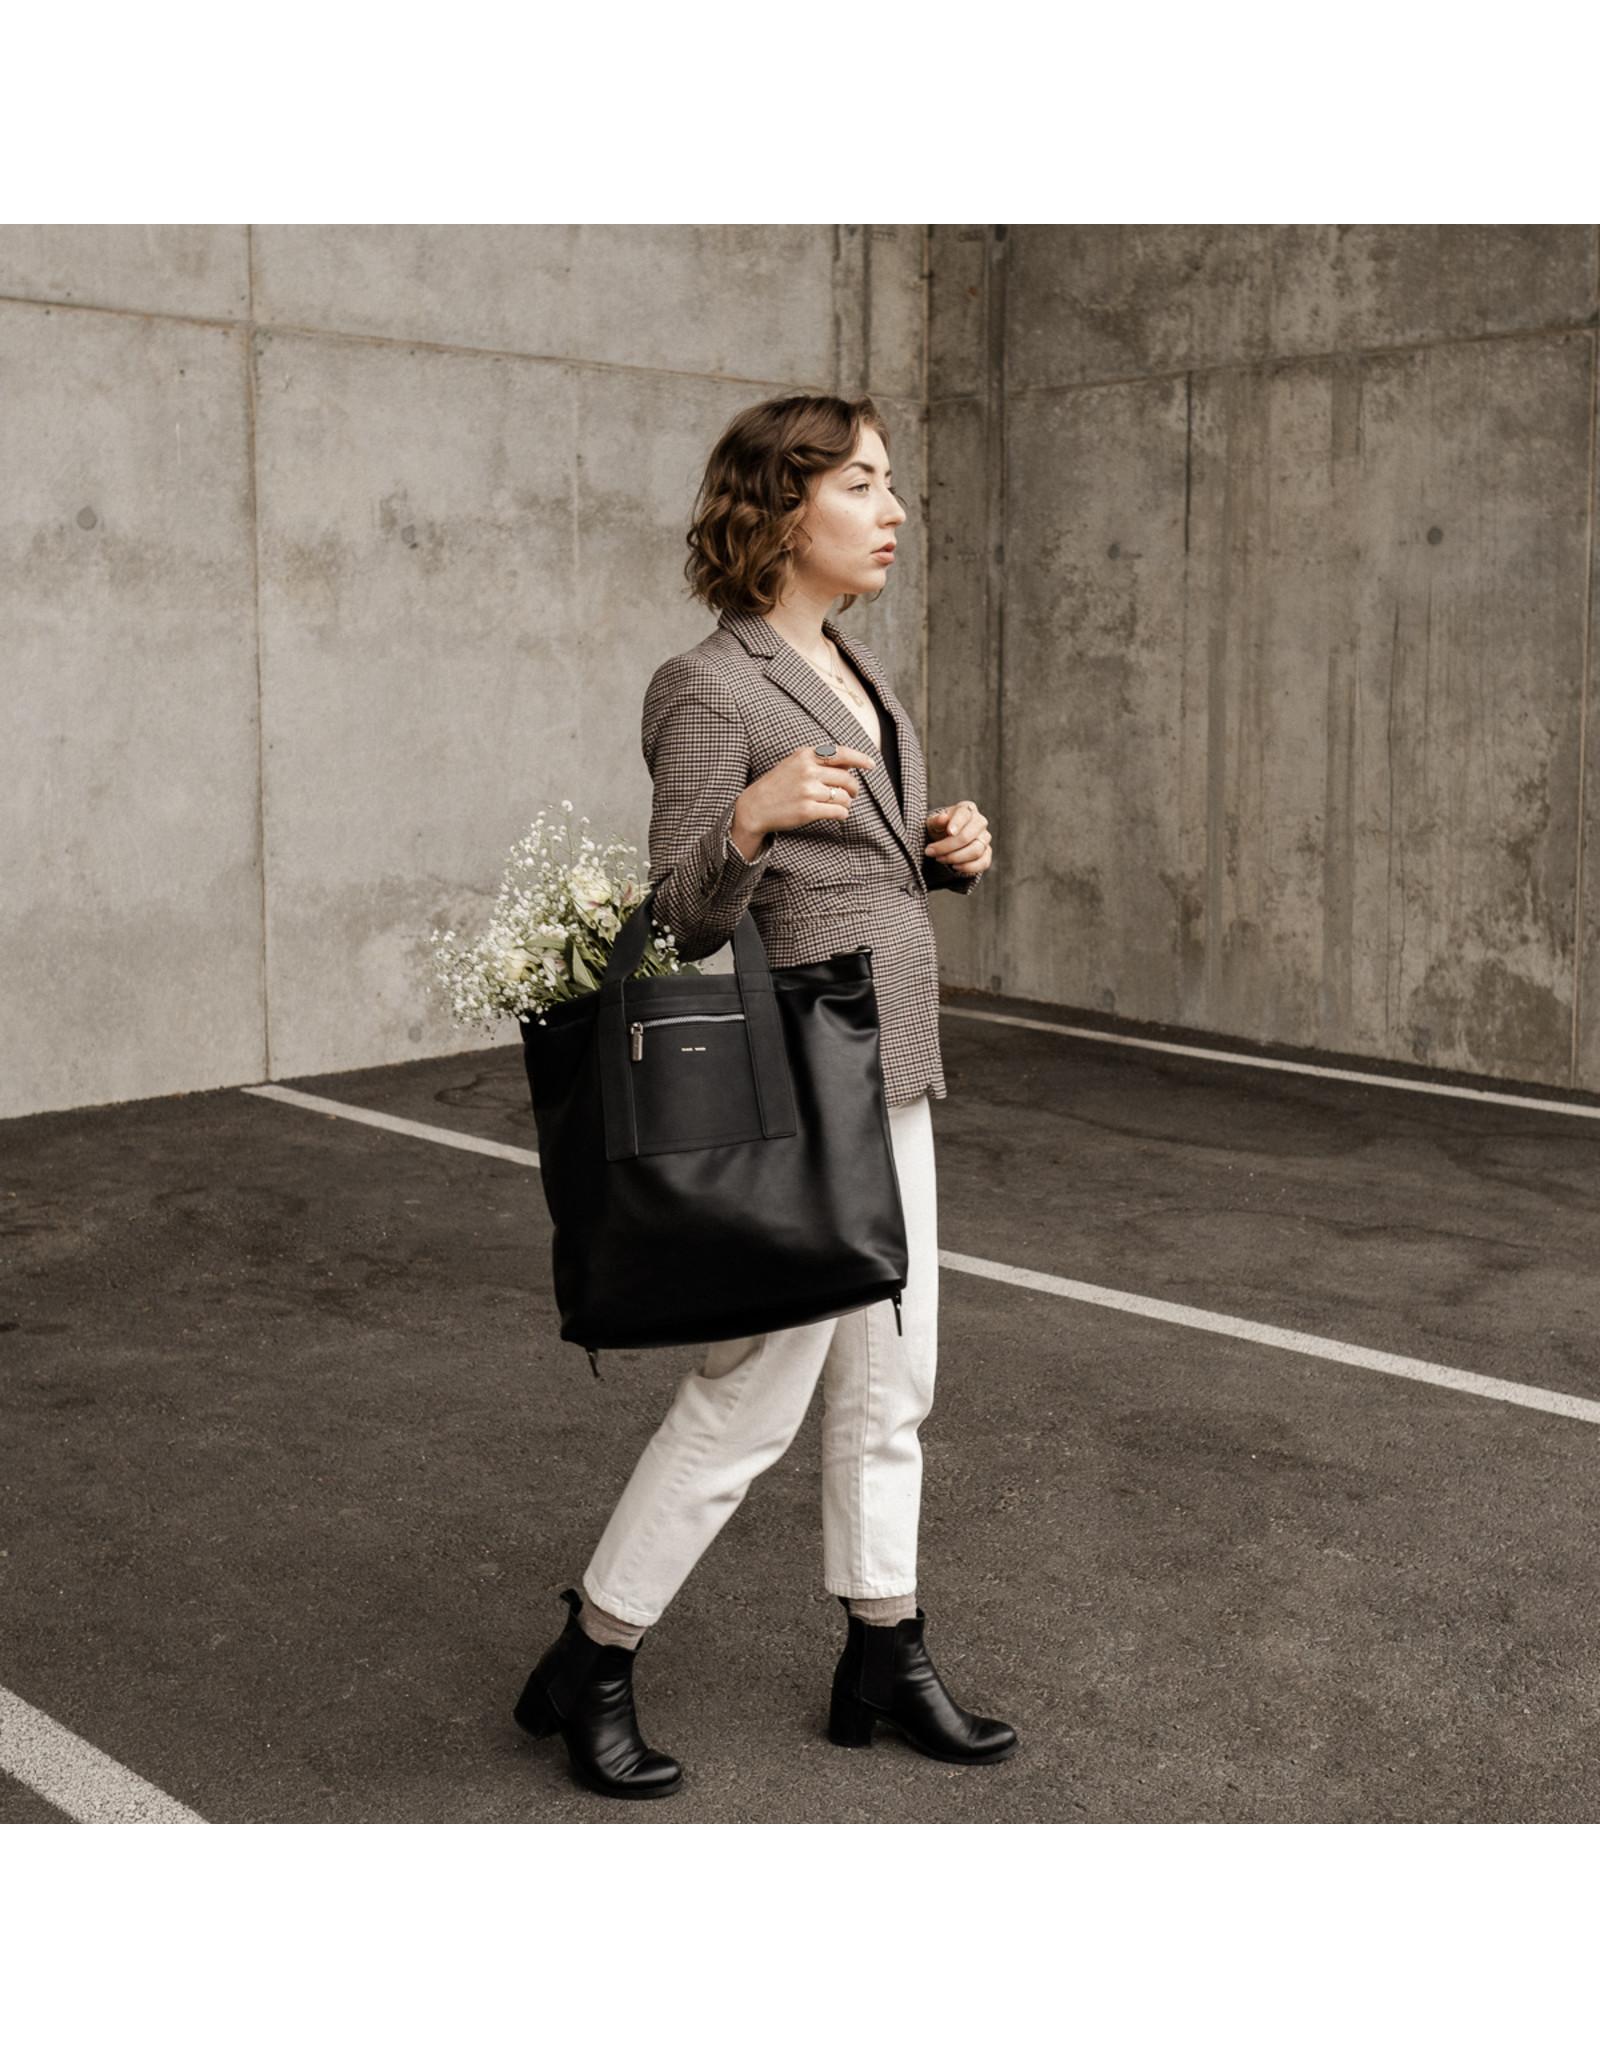 Pixie Mood - Convertible Bag Harper Black